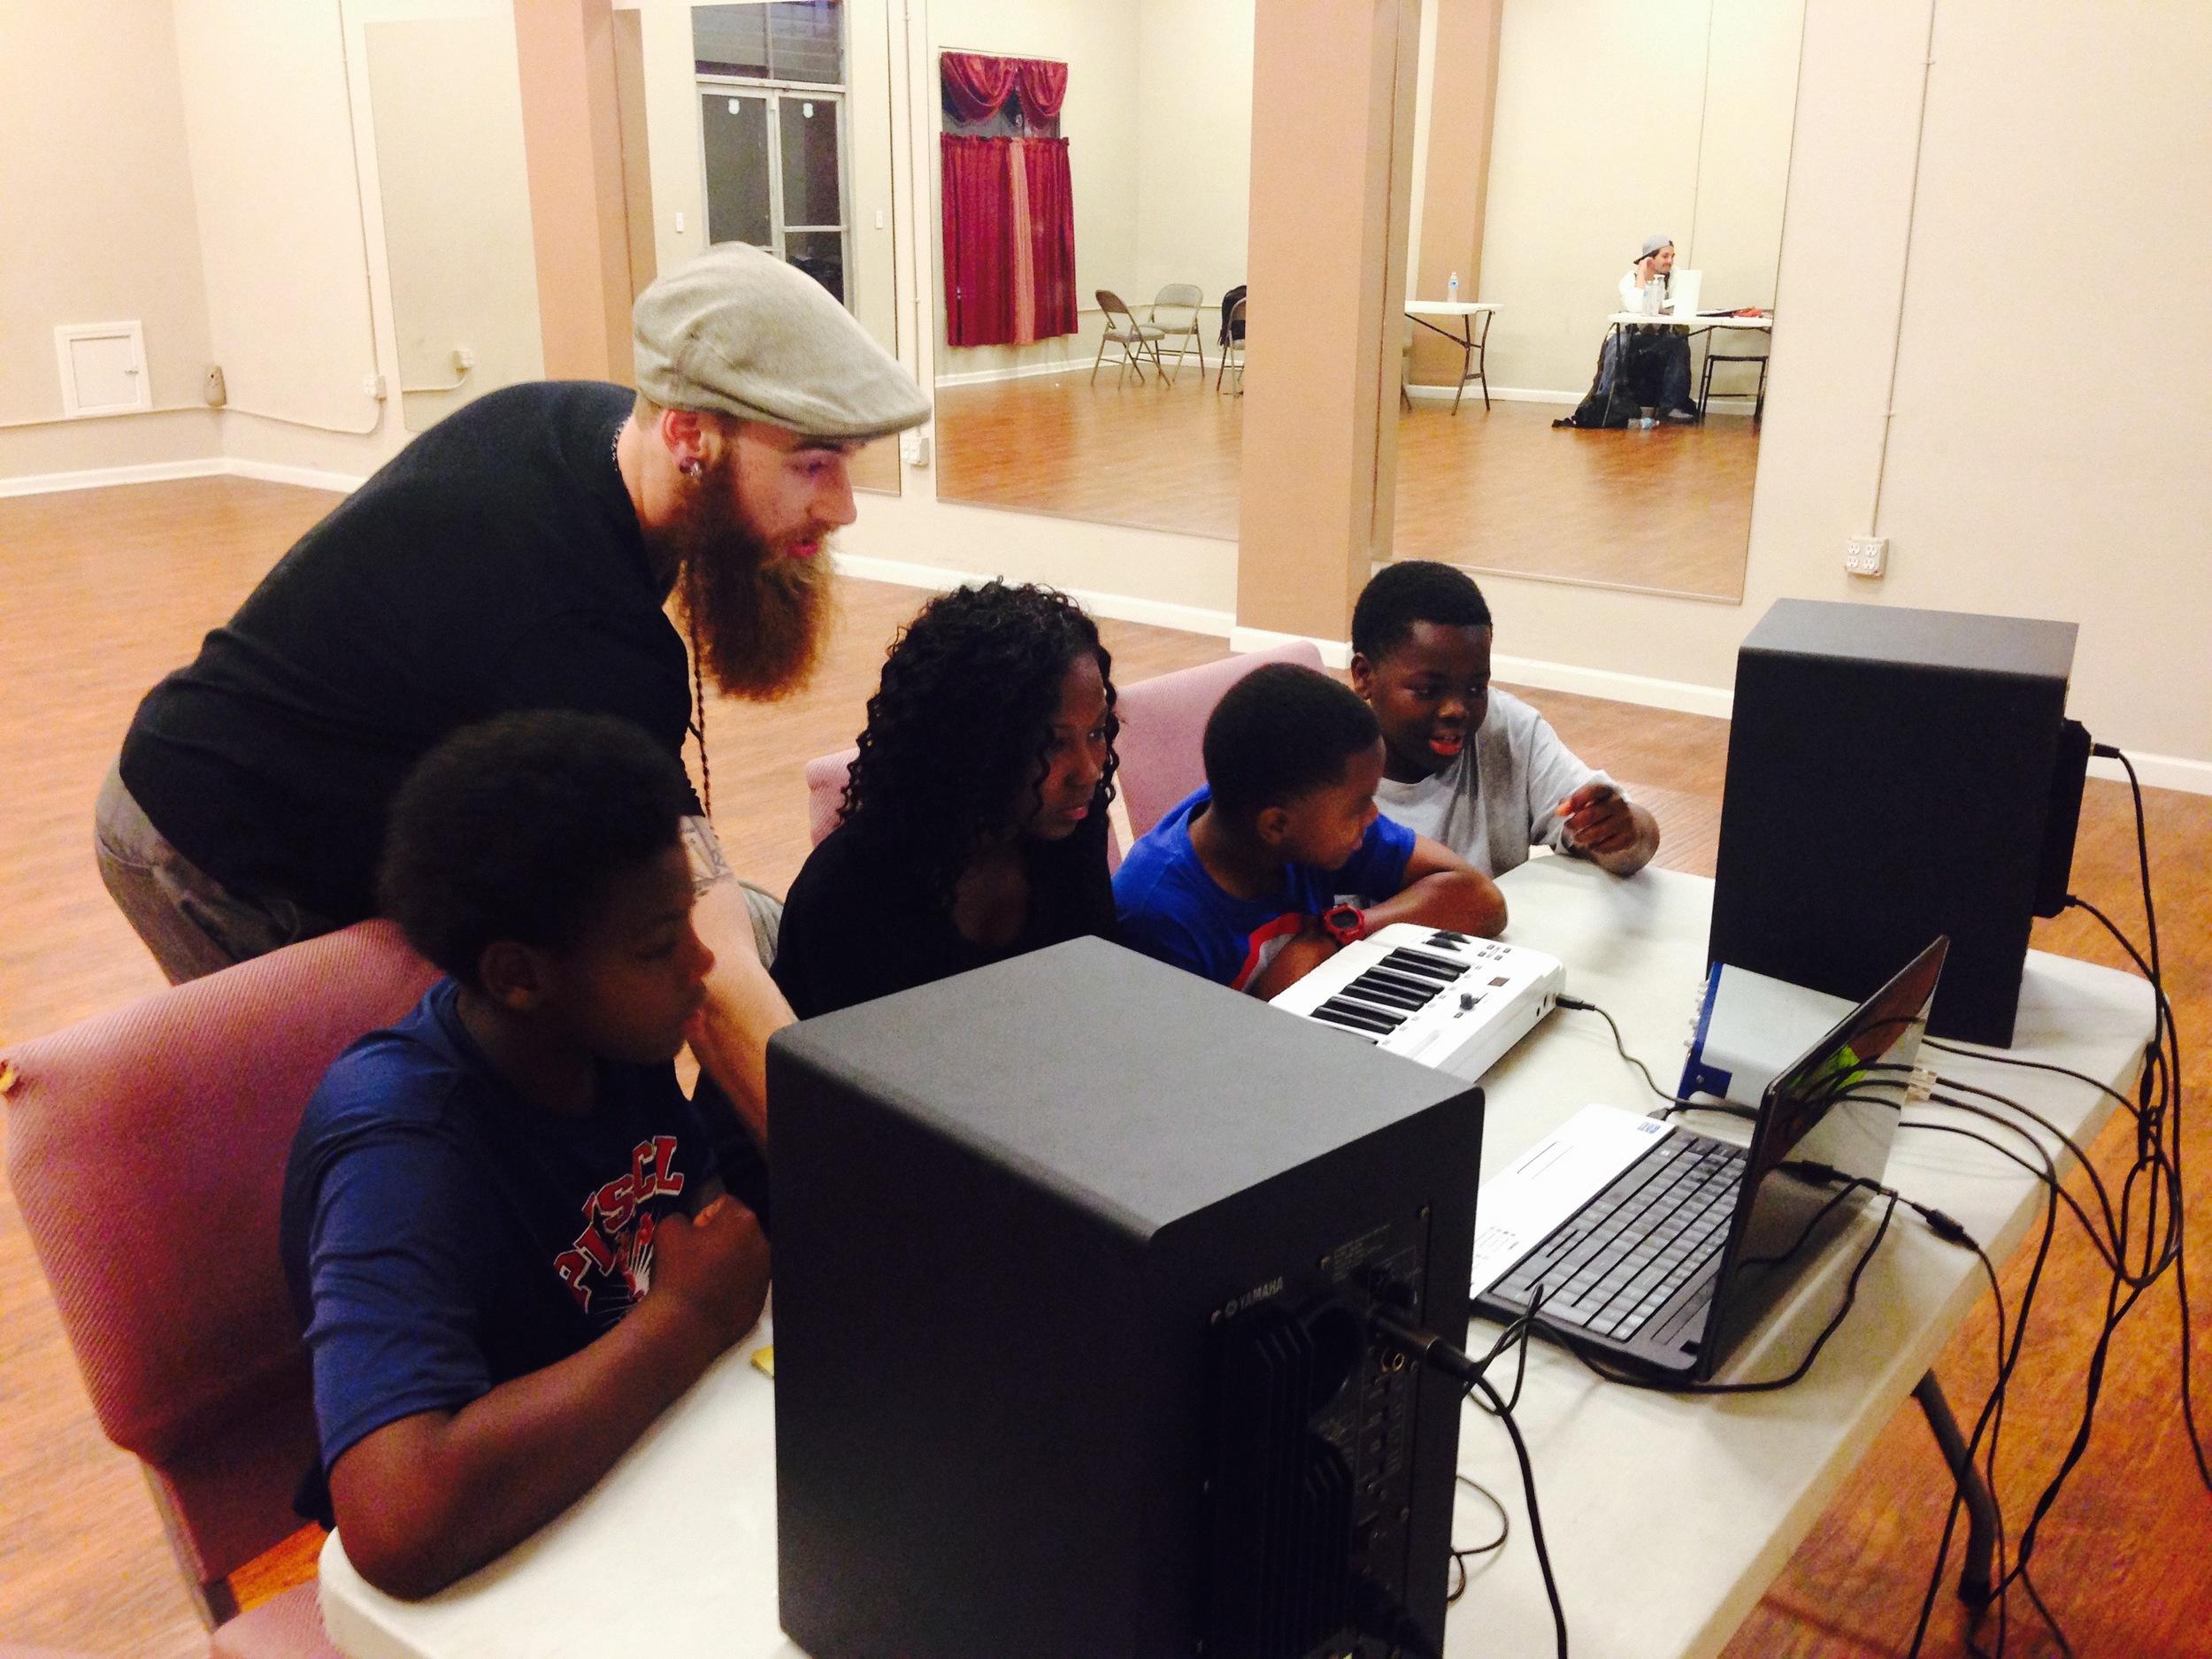 Music Production class with Souljah Keyz